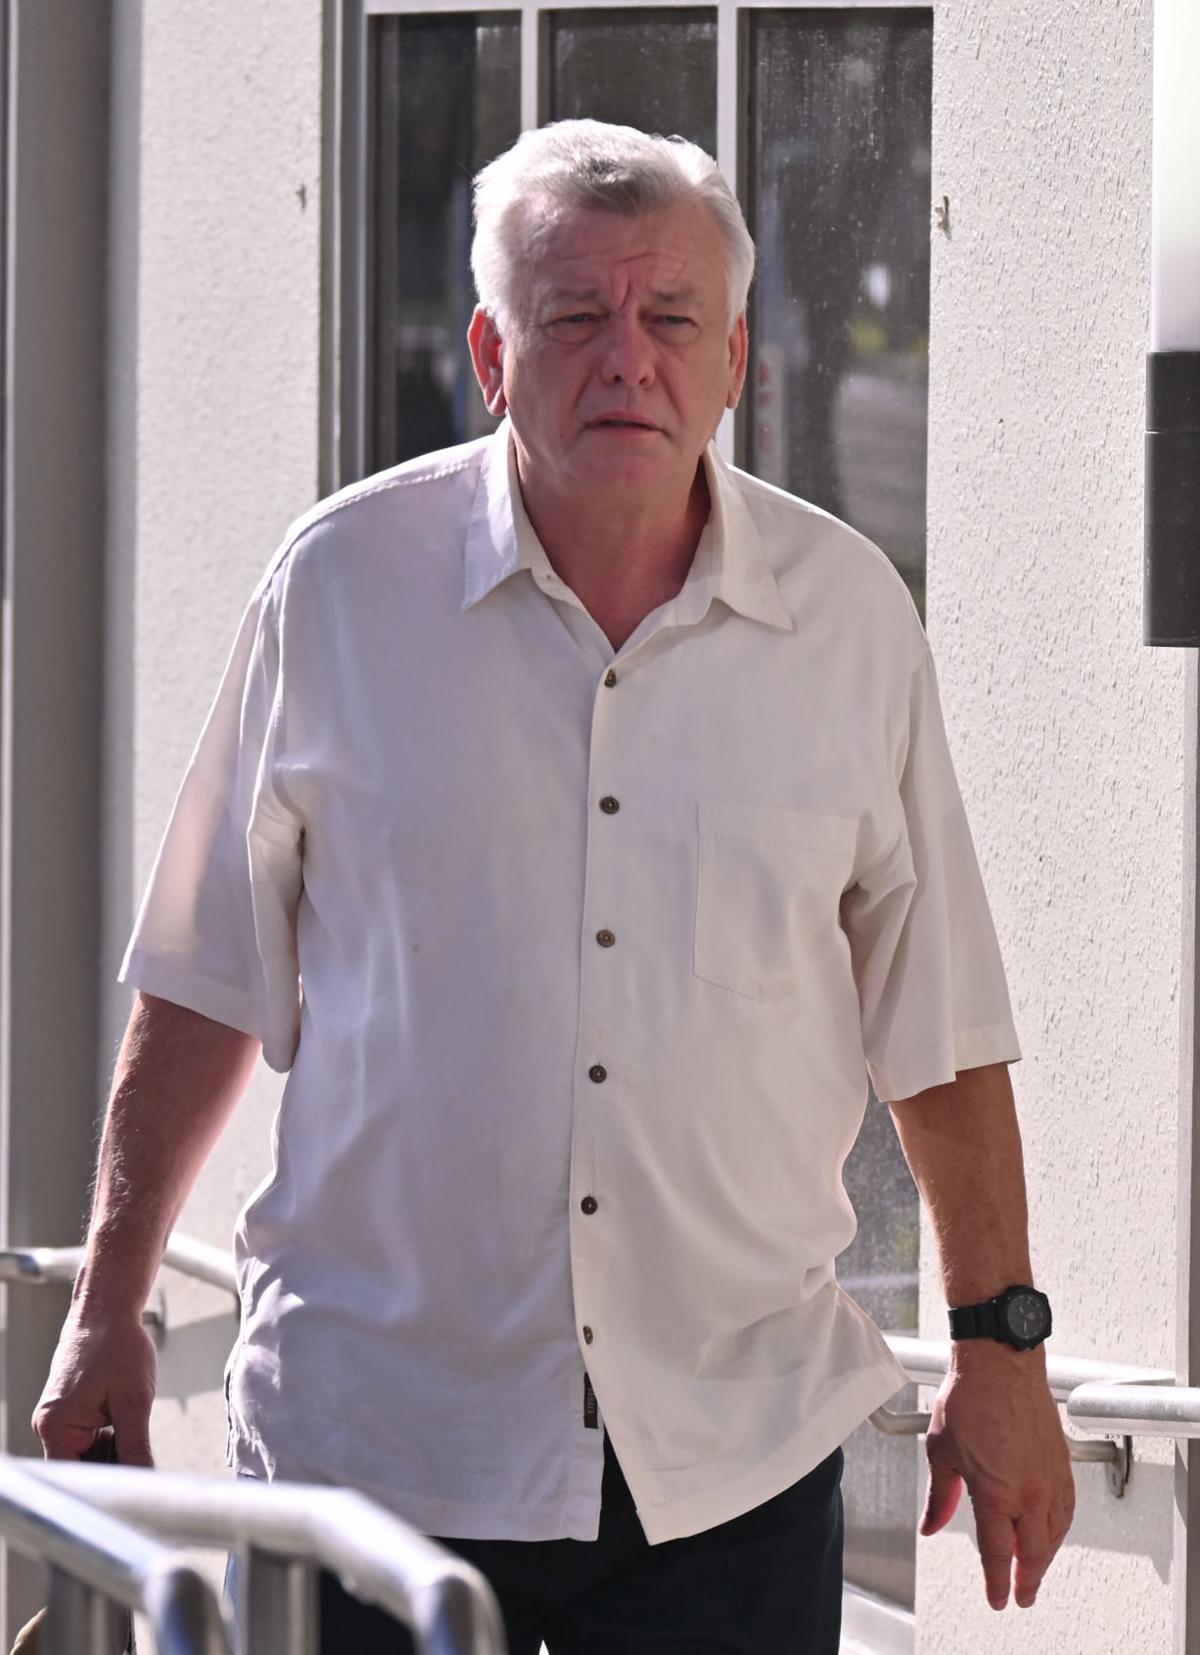 6 sentenced for $10.8M Medicare ambulance fraud